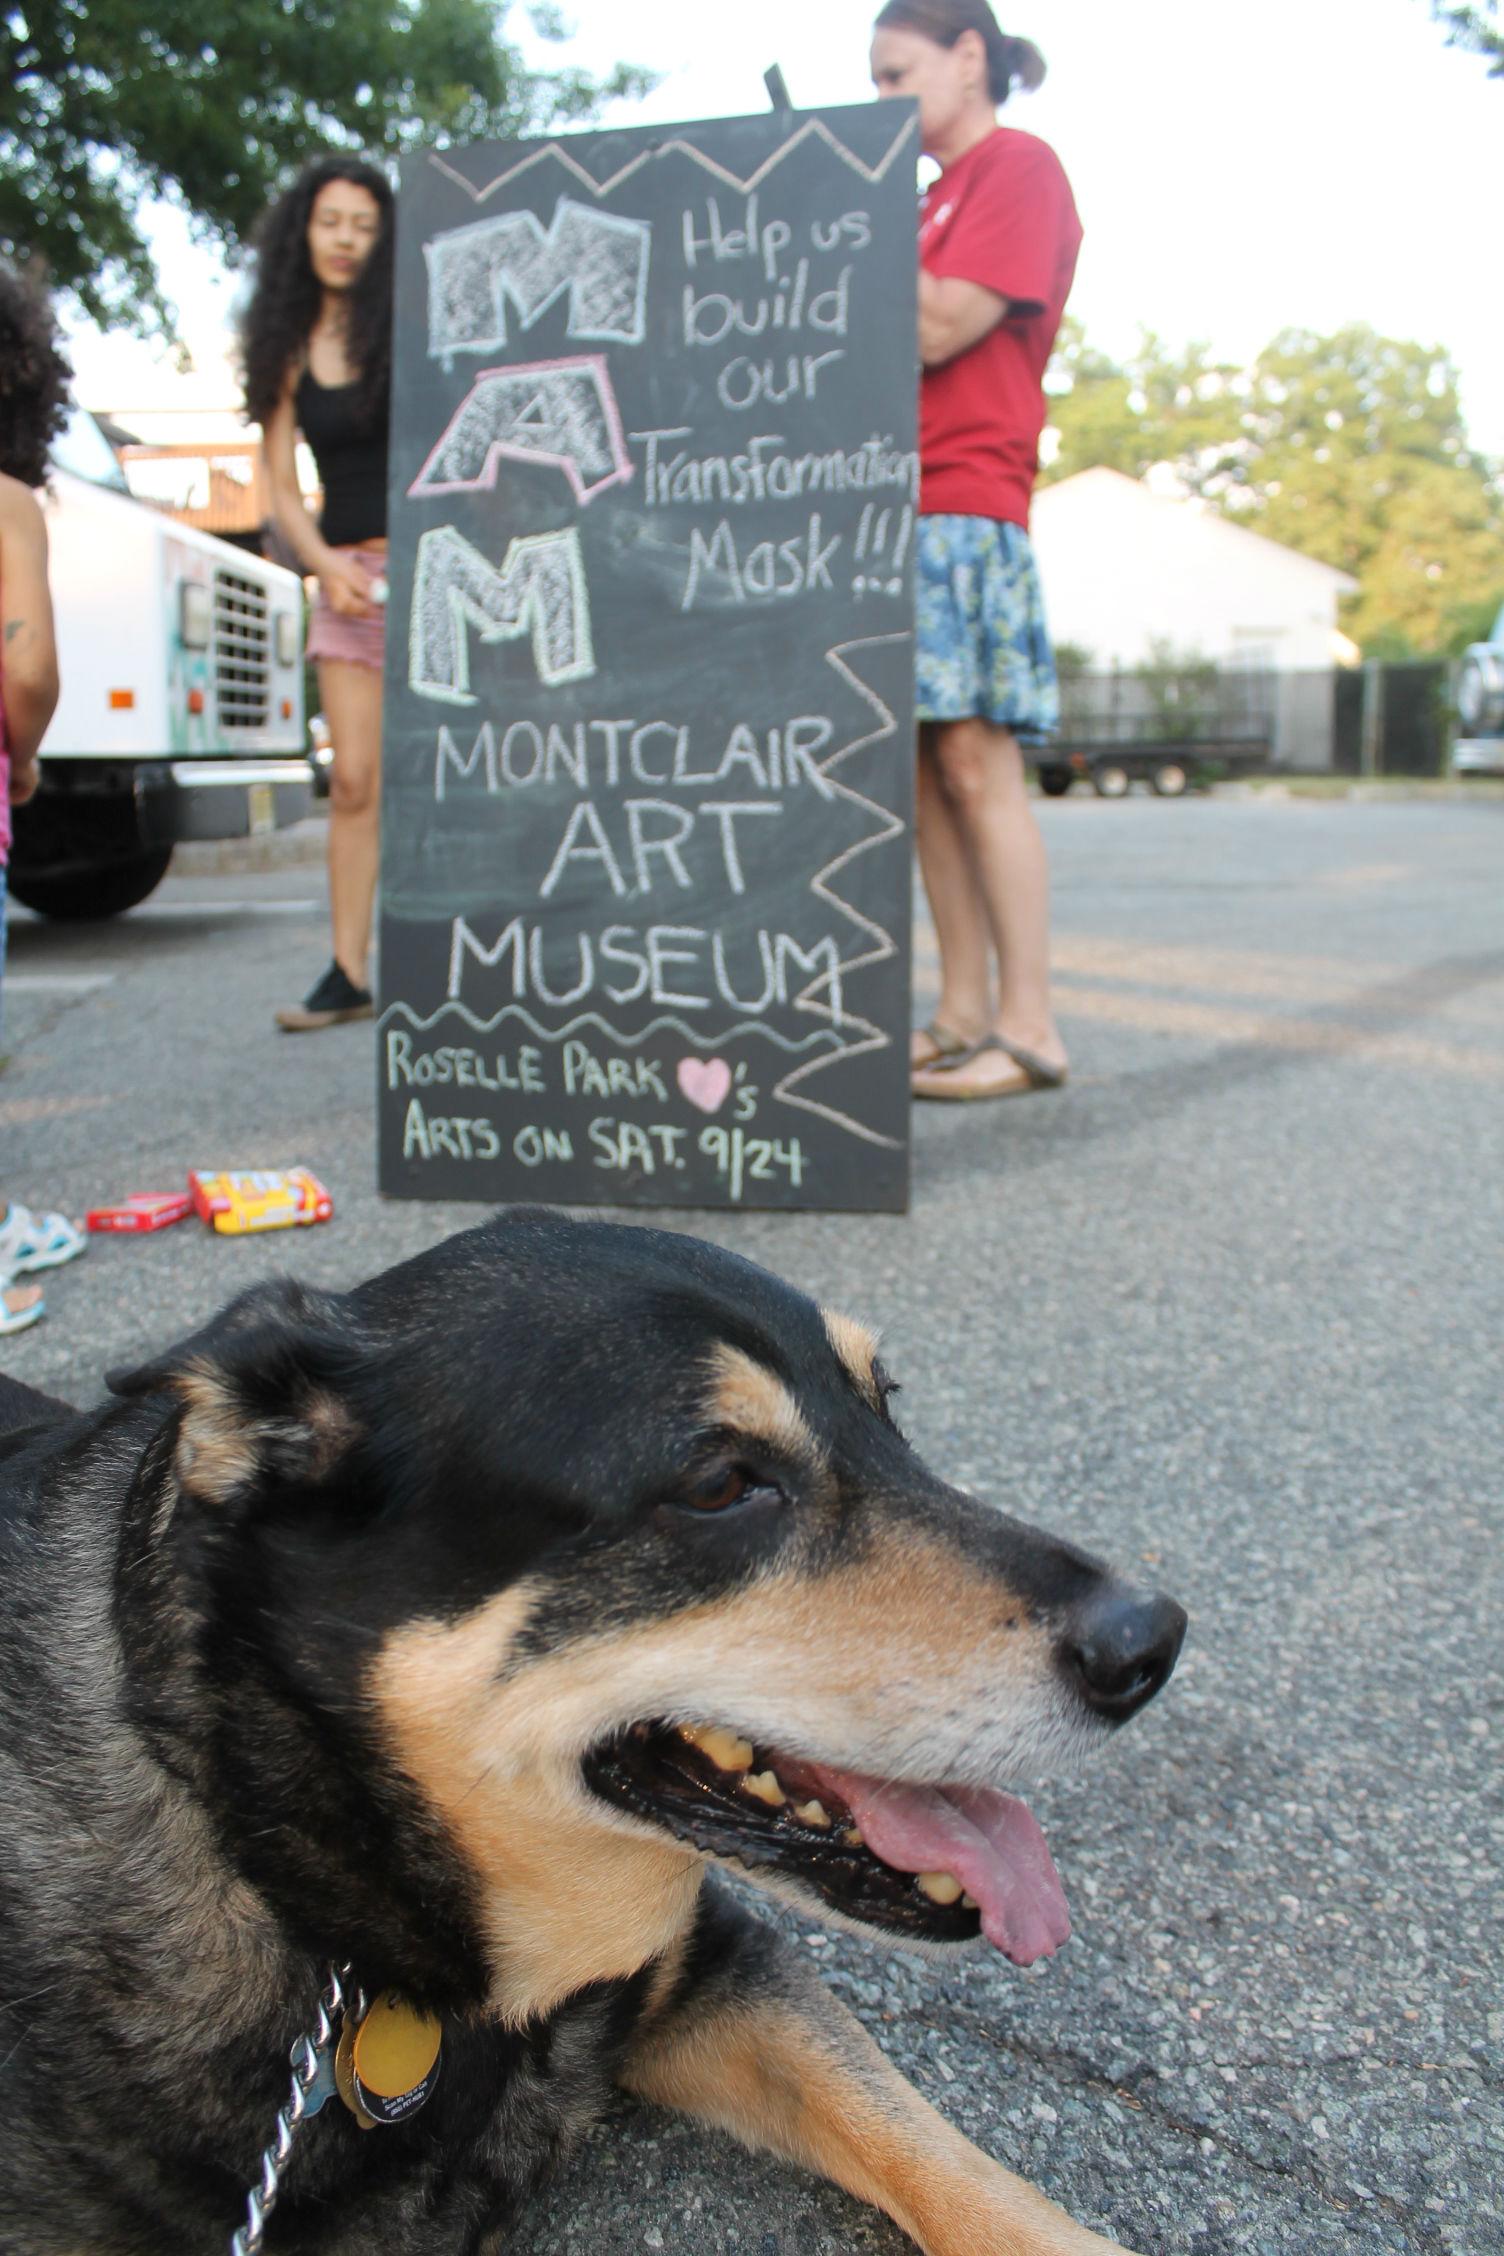 Montclair Art Museum (MAM ) Truck to Participate in Roselle Park Loves Arts! Festival